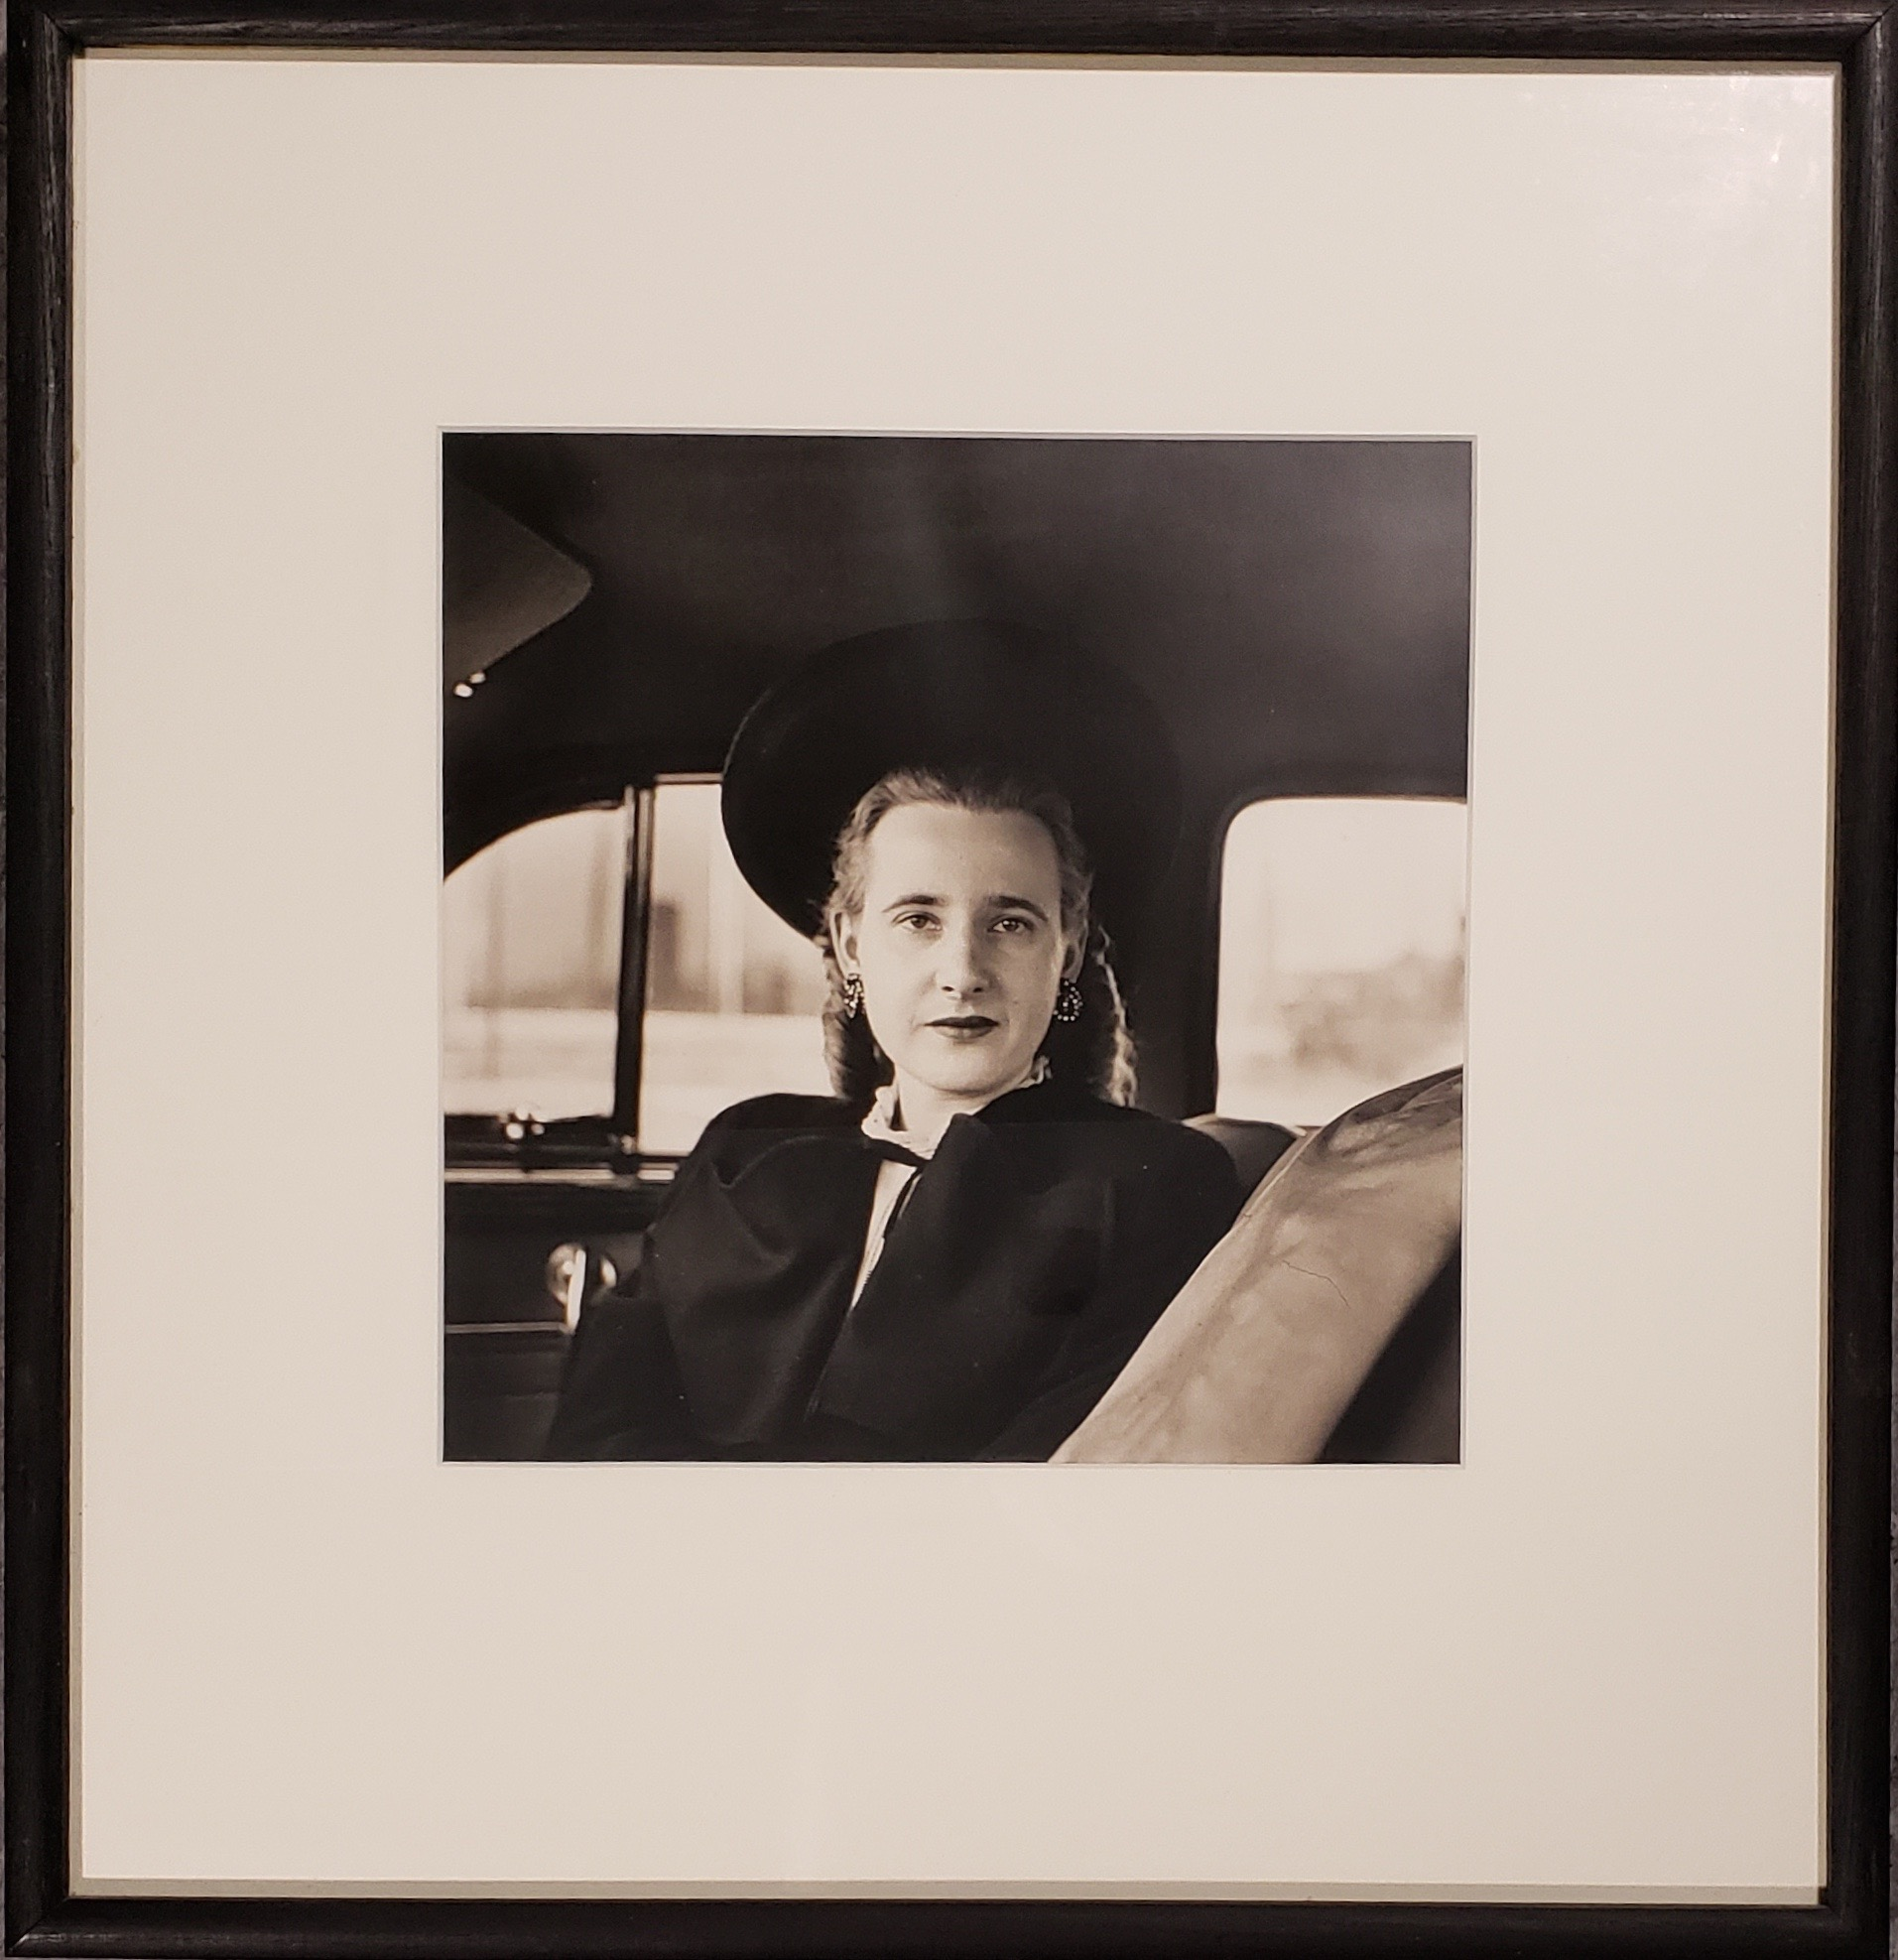 Irving Fistell, Shirley, circa 1940-50